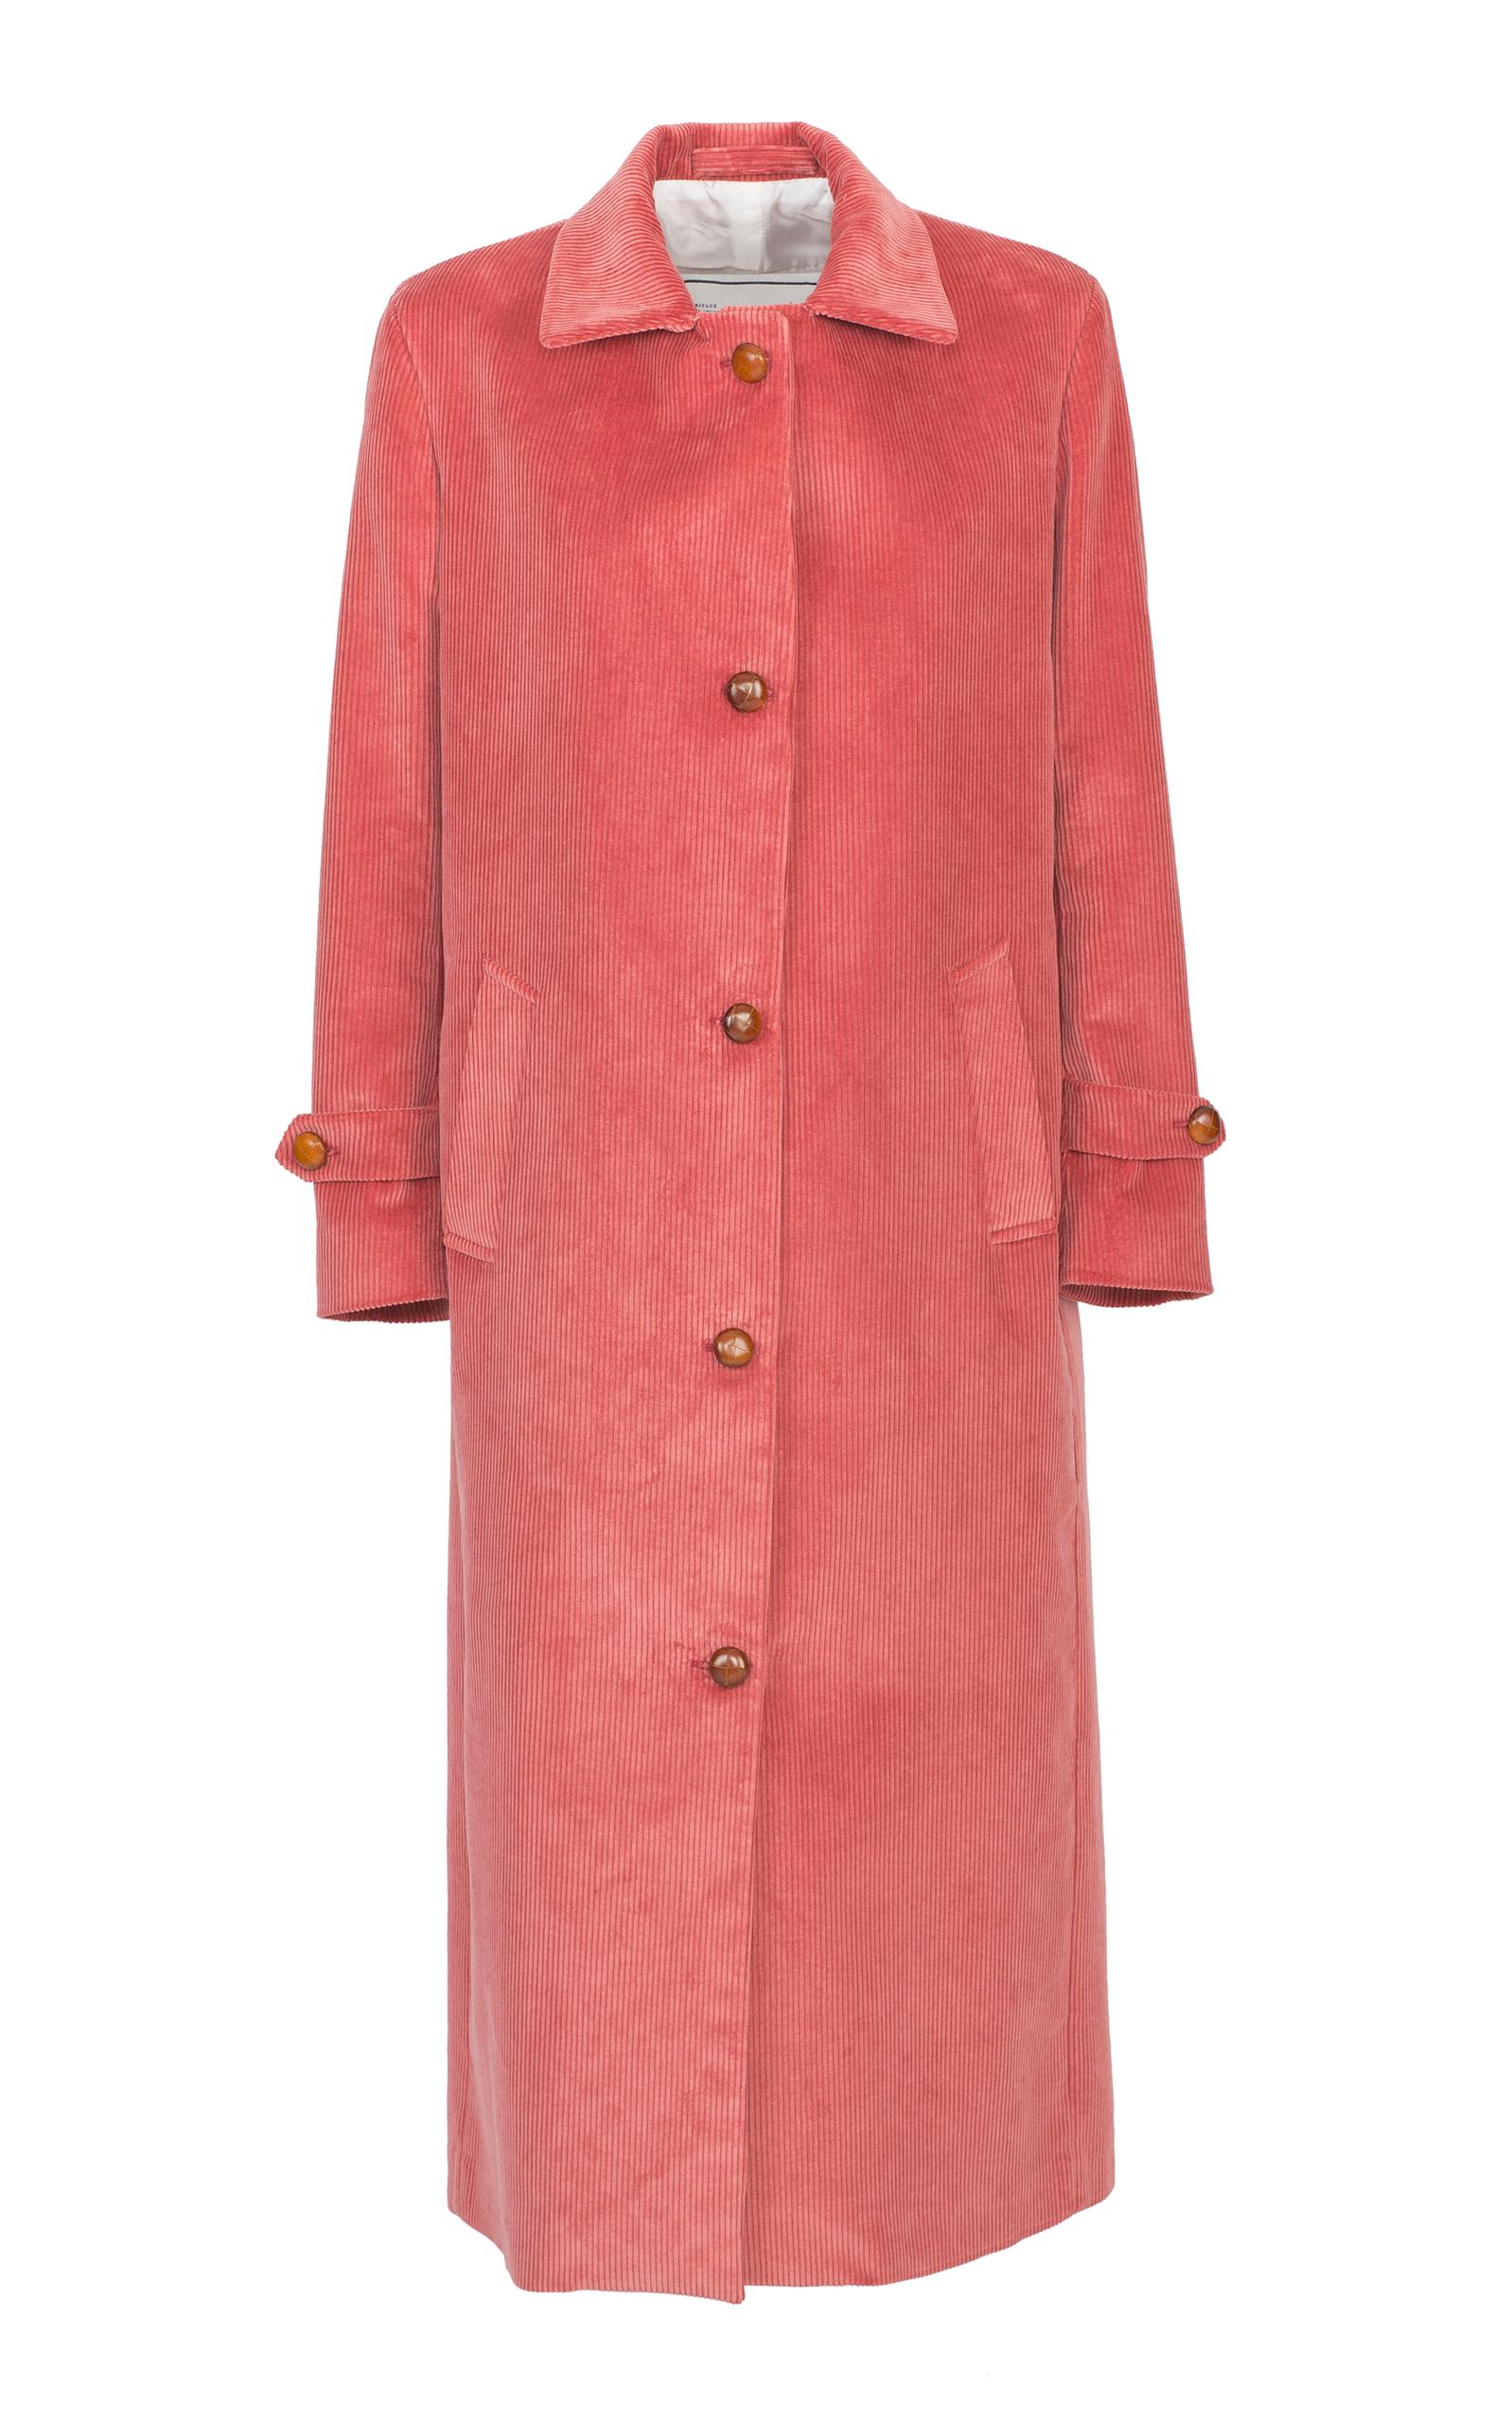 The Maria Corduroy Midi Coat in Pink